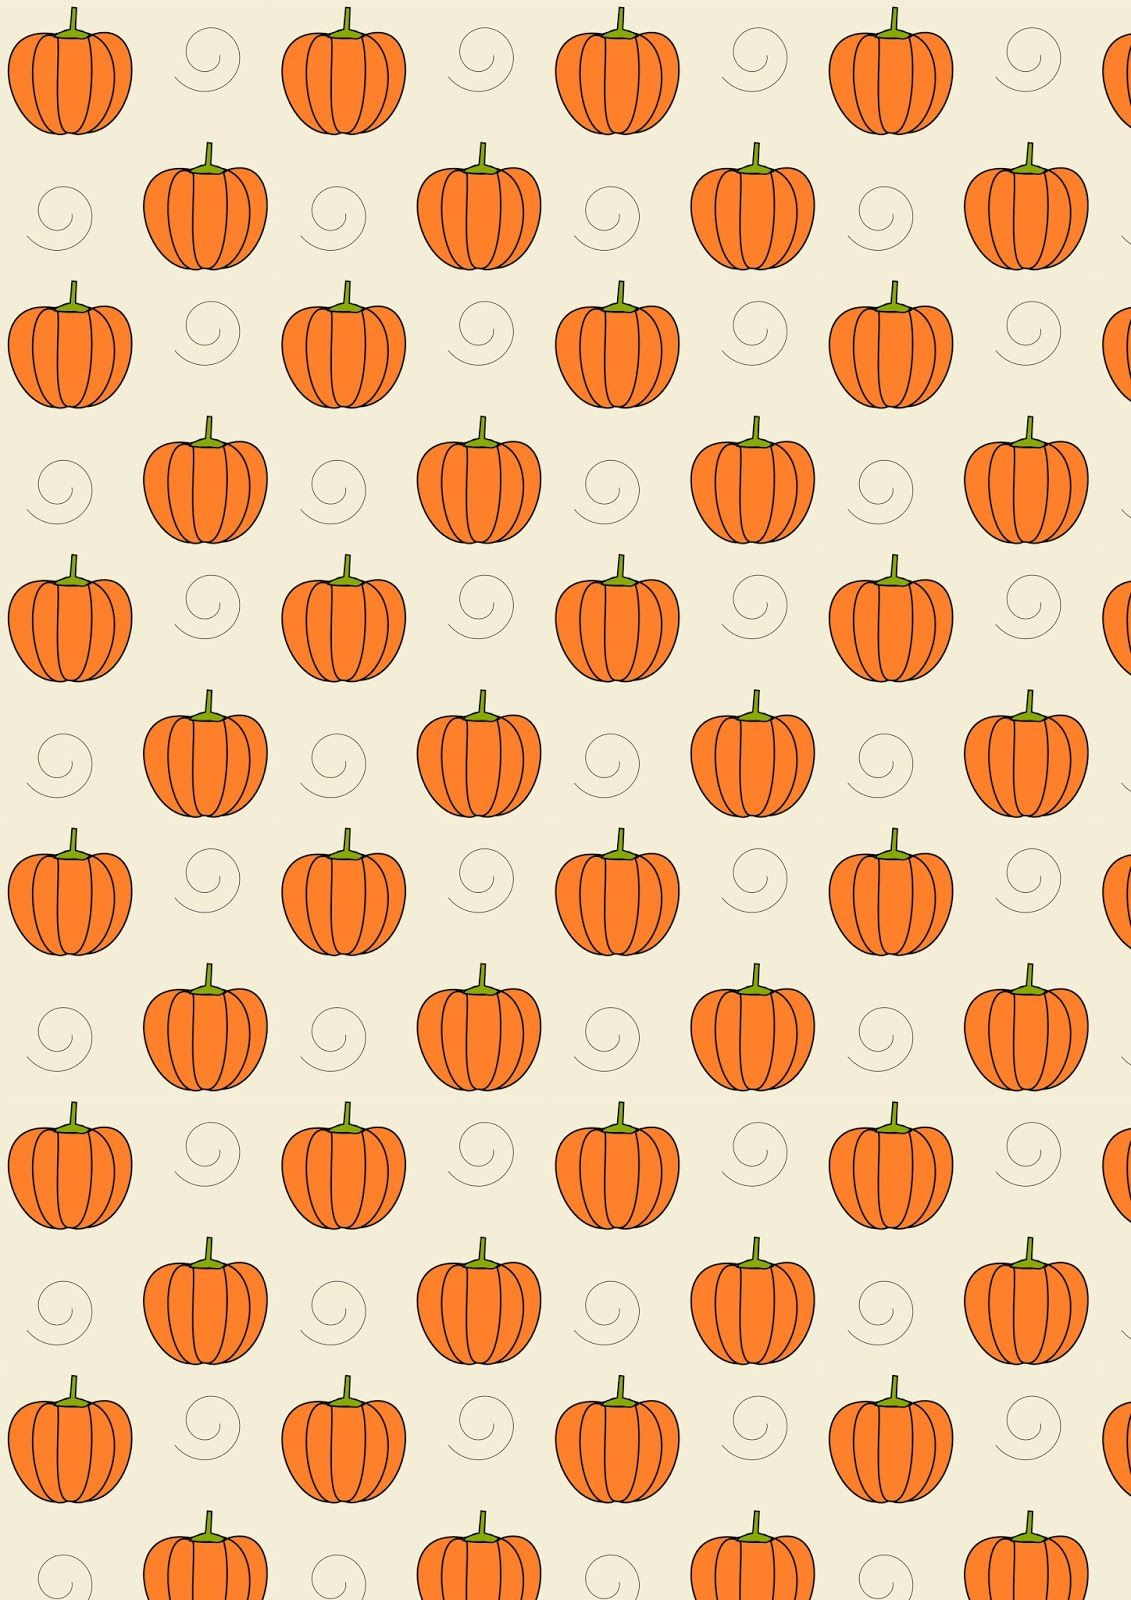 Pumpkin clipart wallpaper for fall png transparent Free digital pumpkin scrapbooking paper - ausdruckbares ... png transparent